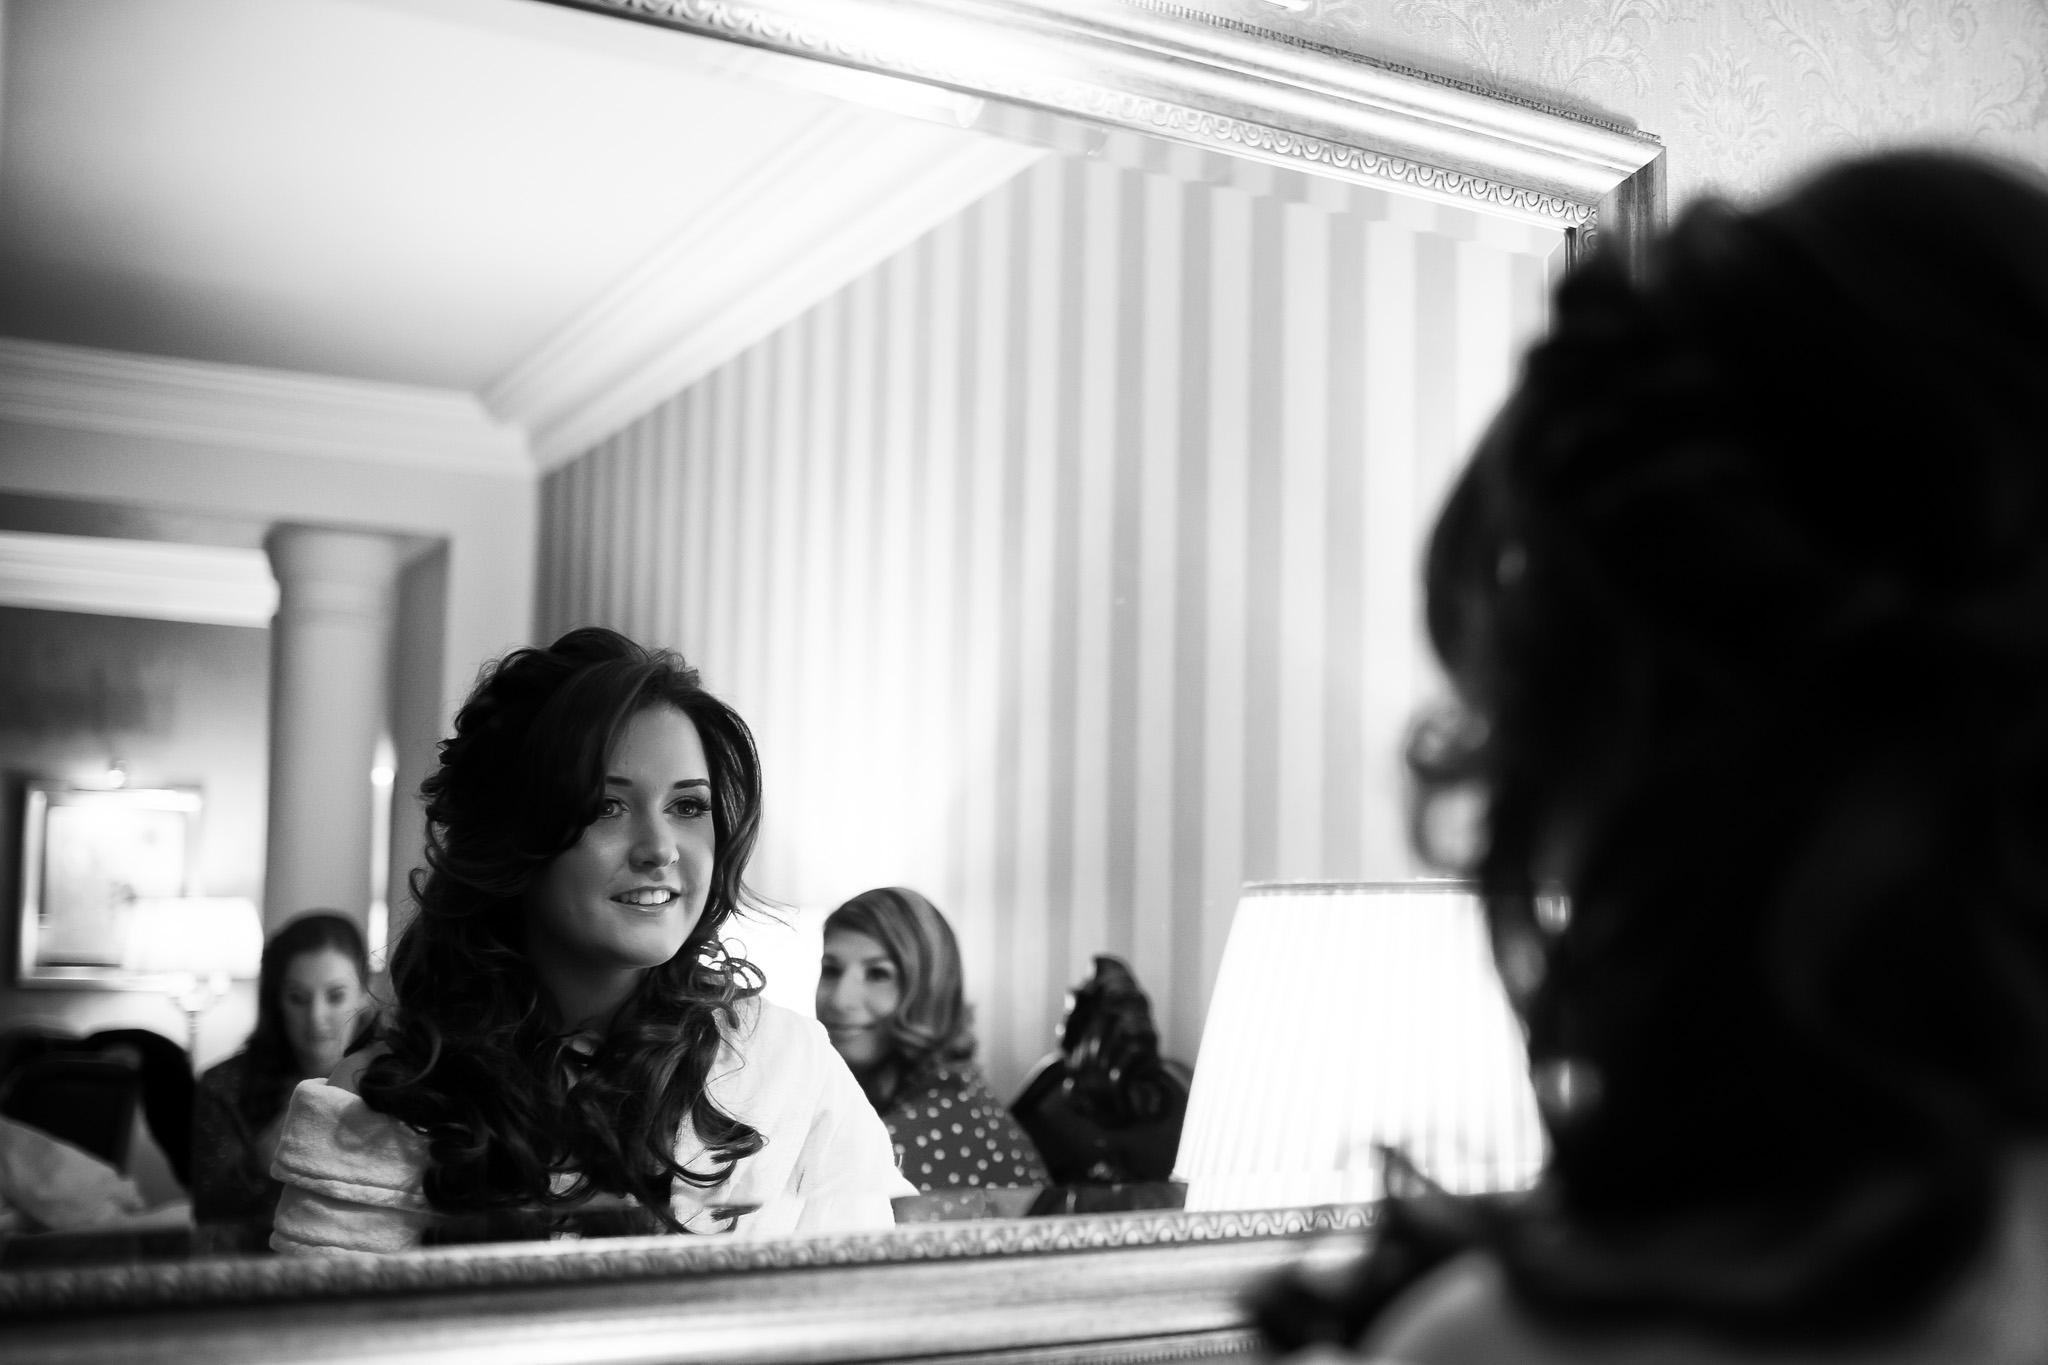 Mark_Barnes_Northern_Ireland_wedding_photographer_Harveys_Point_Donegall_Wedding_photography-Adam&Gemma-2.jpg